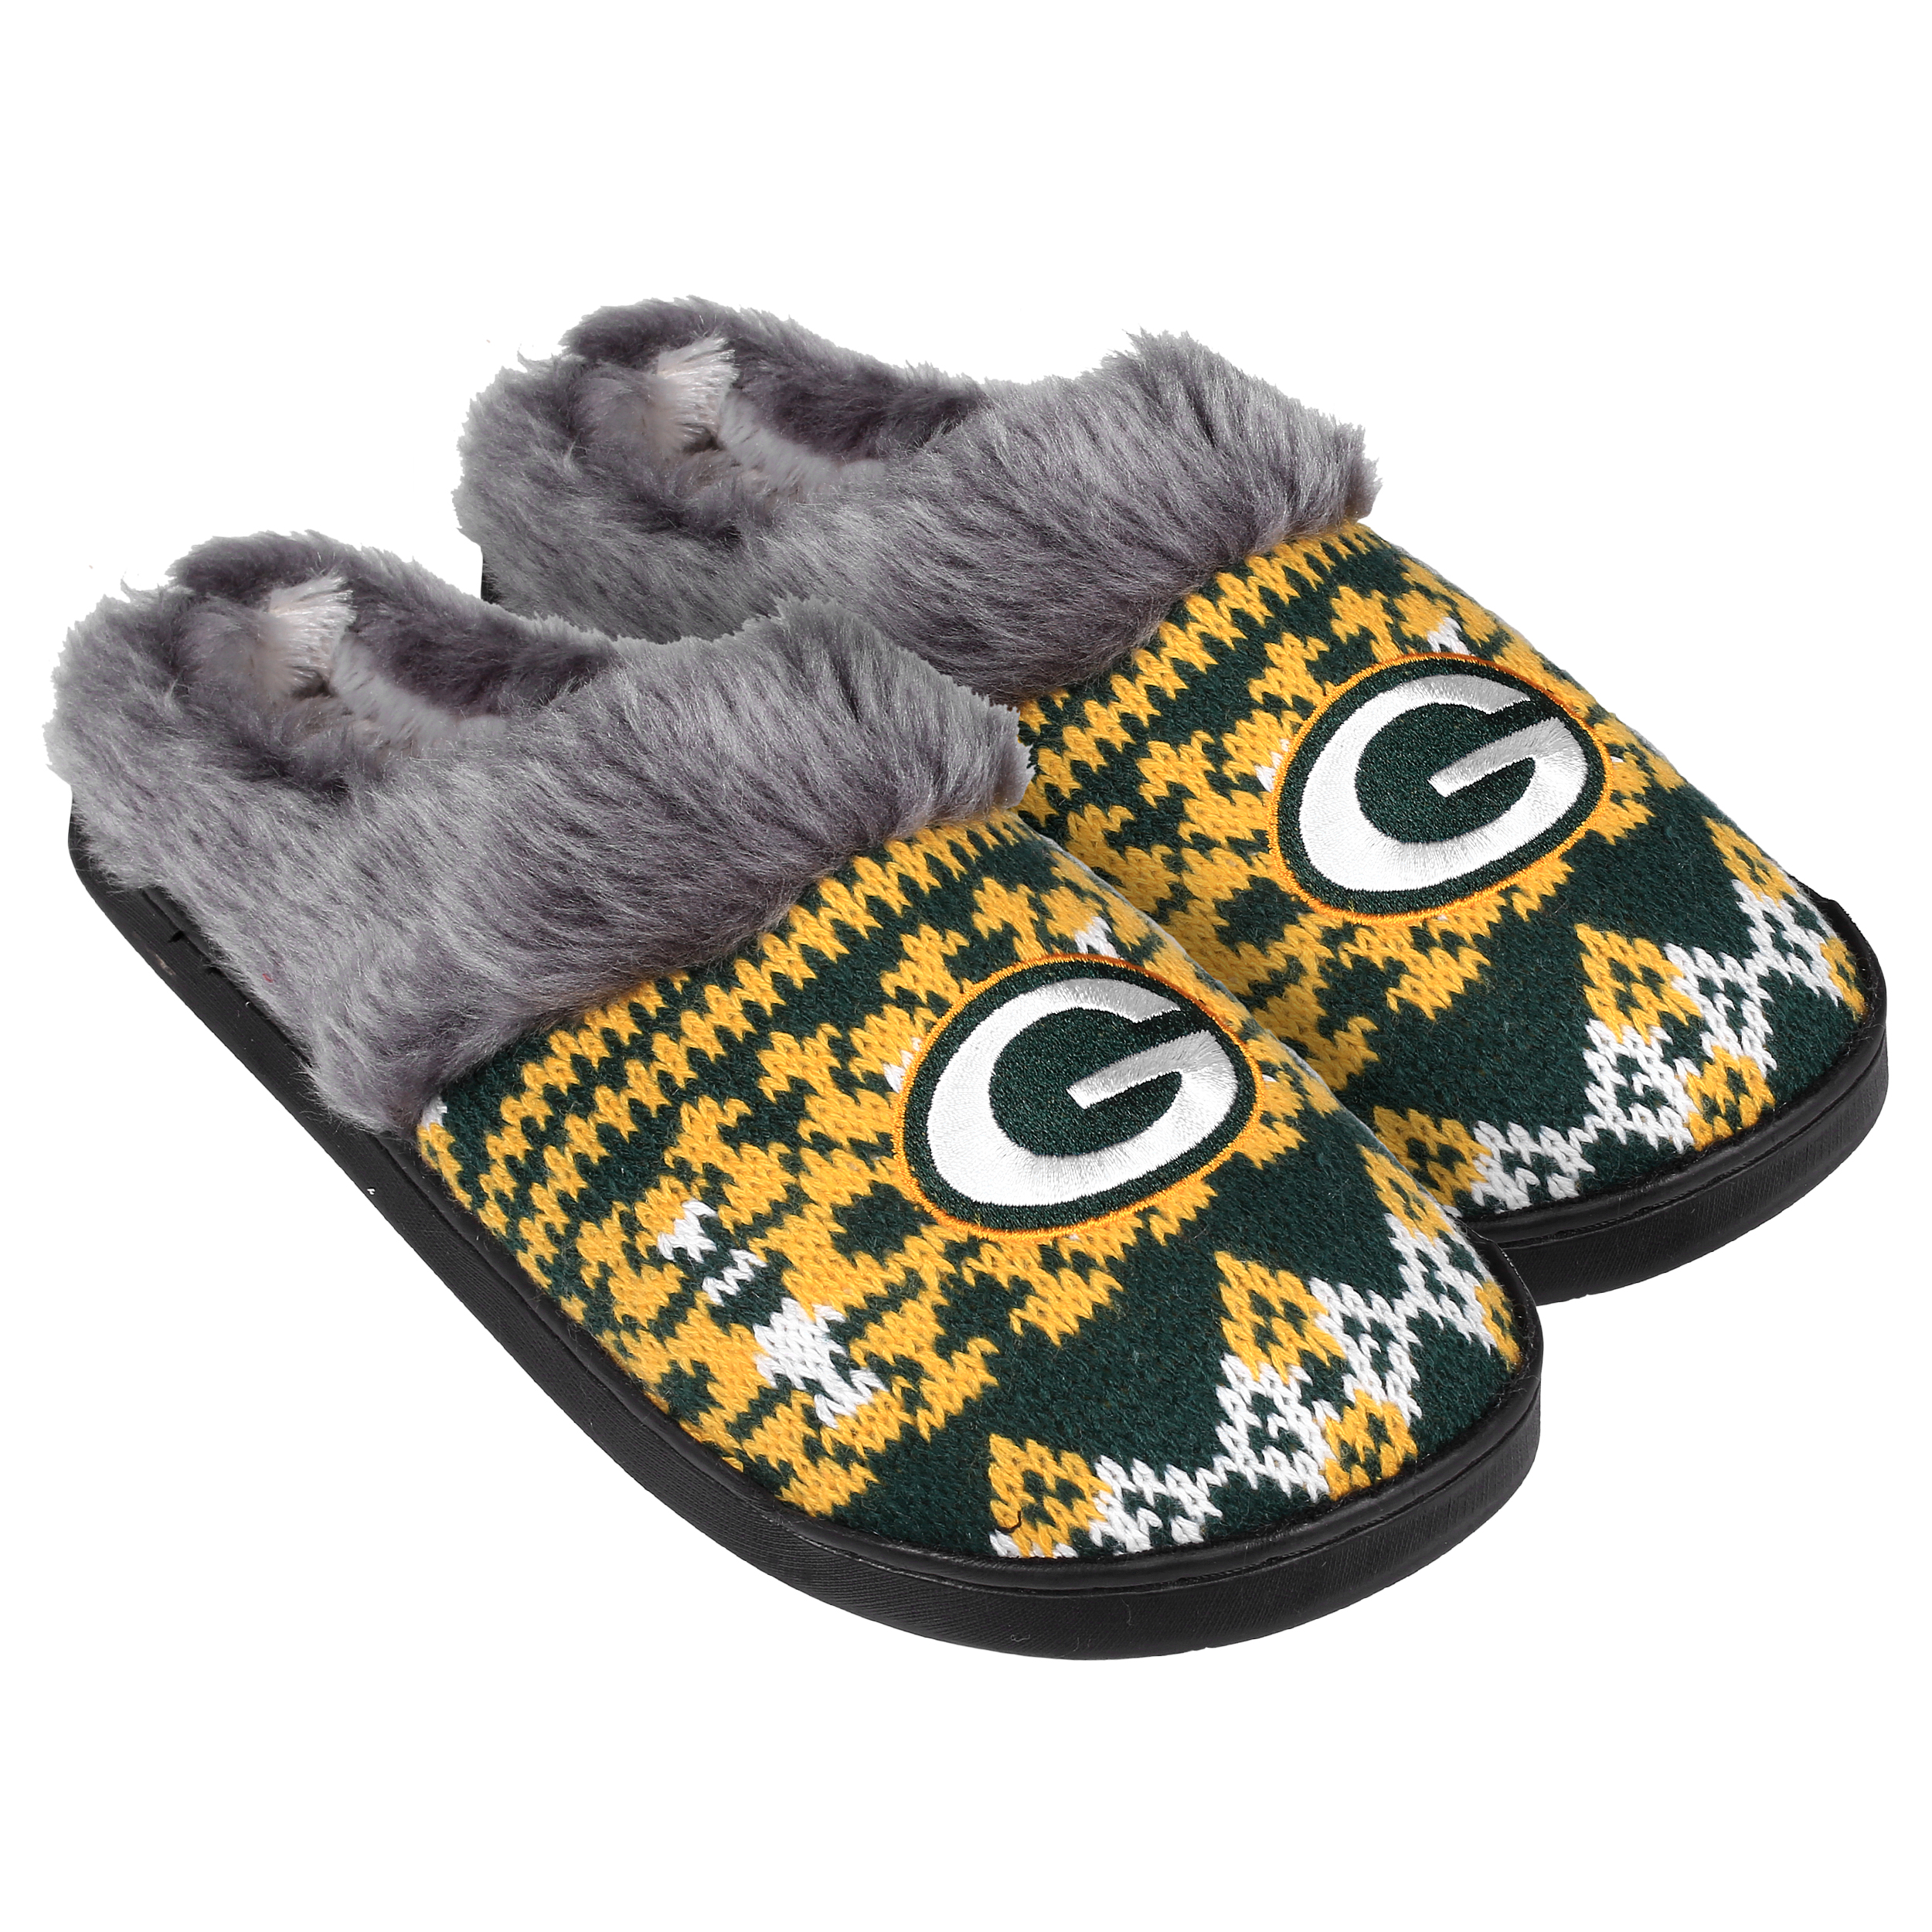 Green Bay Packers Women's Aztec Slide Slipper - 12pc Case